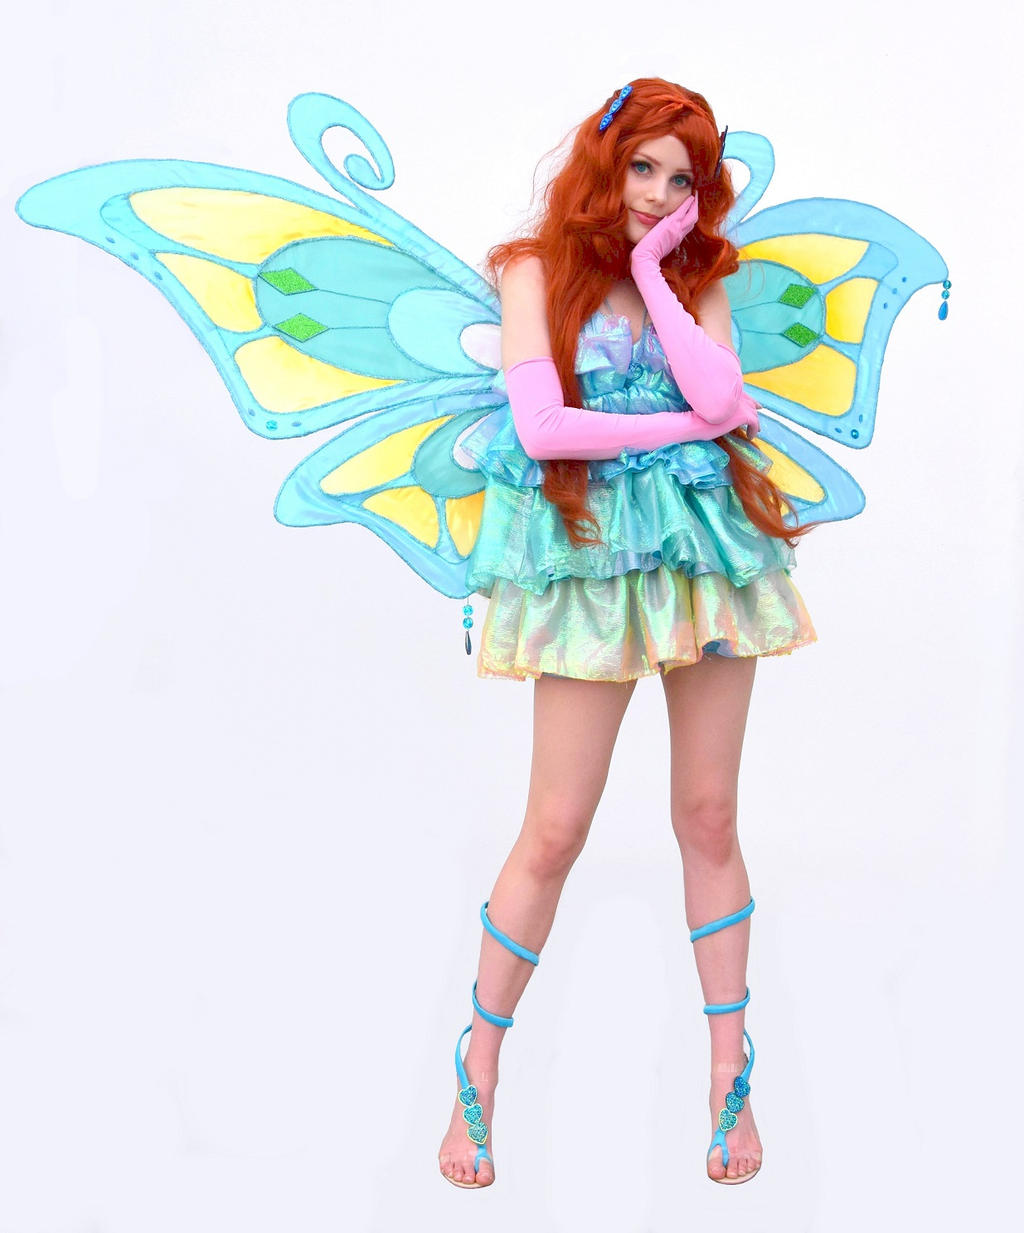 Winx club bloom cosplay